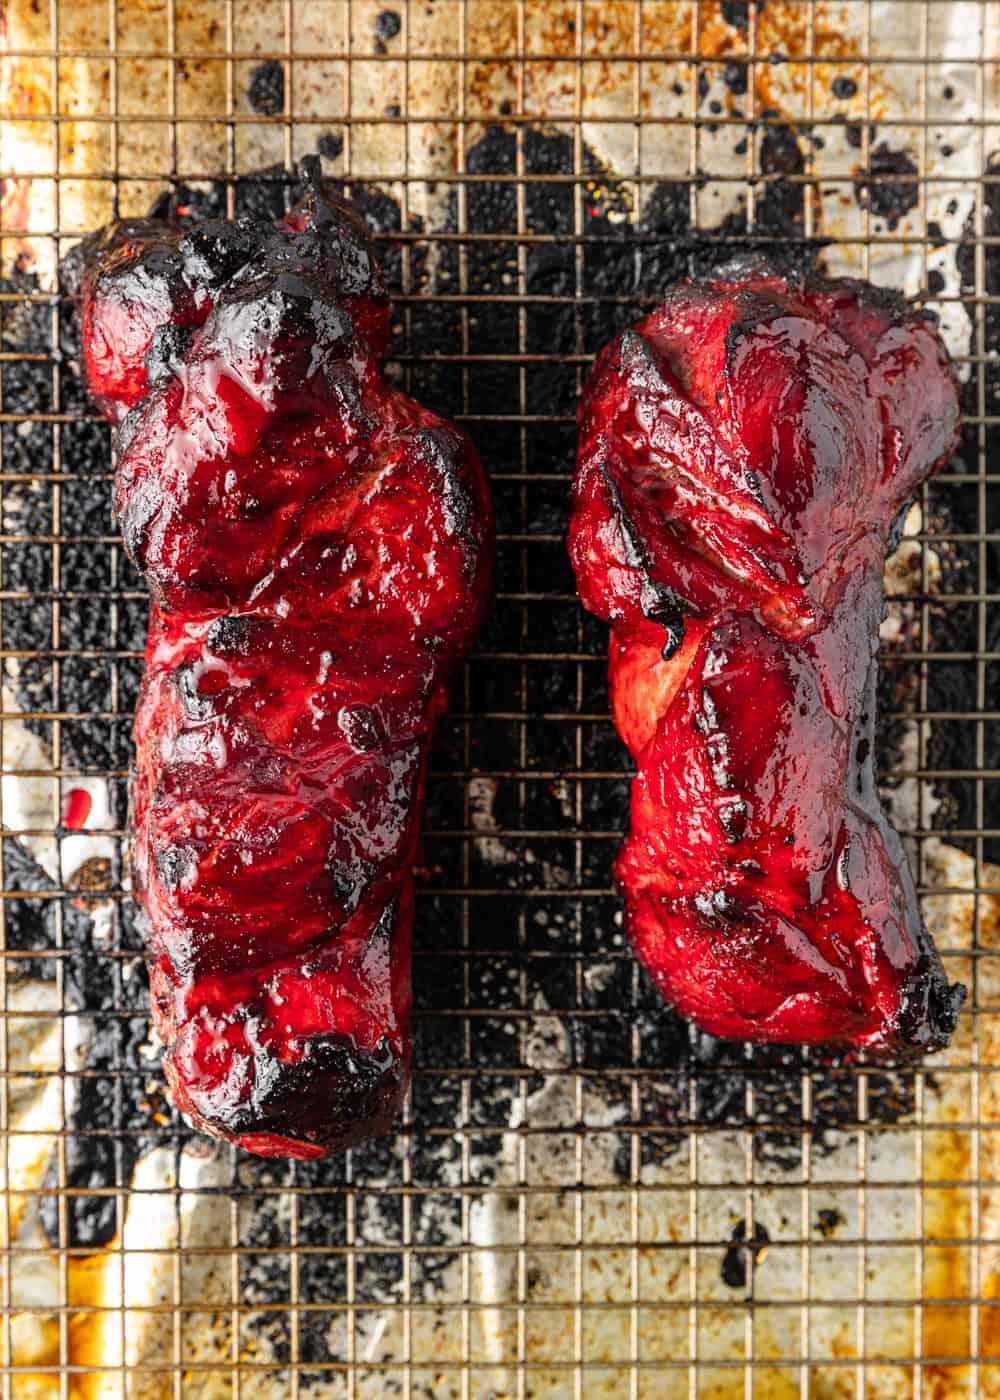 2 Chinese Barbecue Pork strips on baking sheet glazed